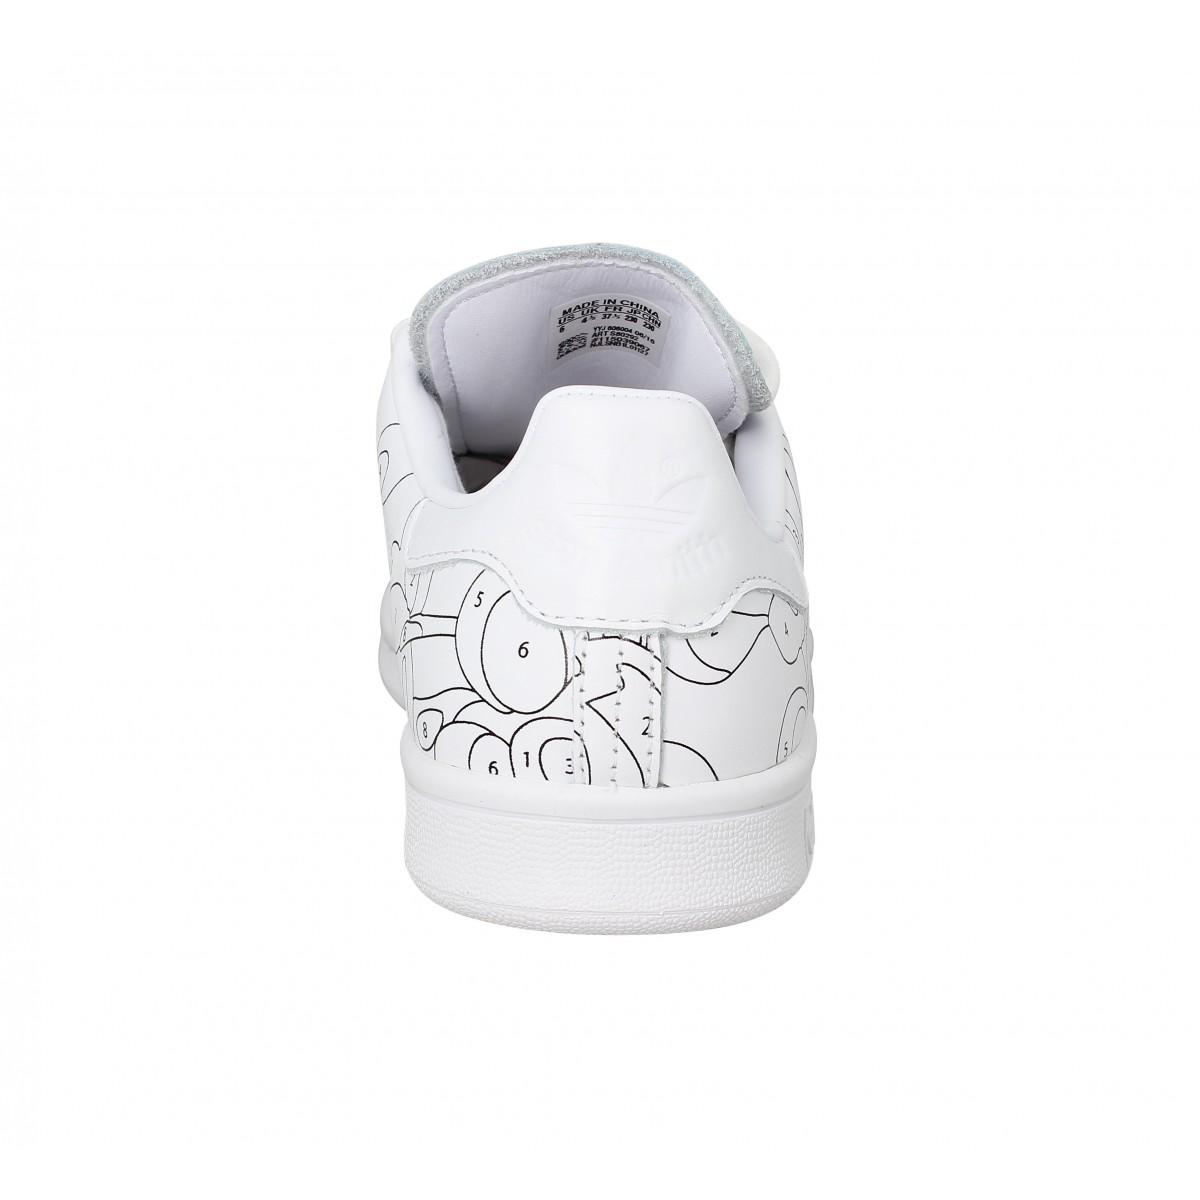 Adidas x rita ora stan smith blanc femme | Fanny chaussures